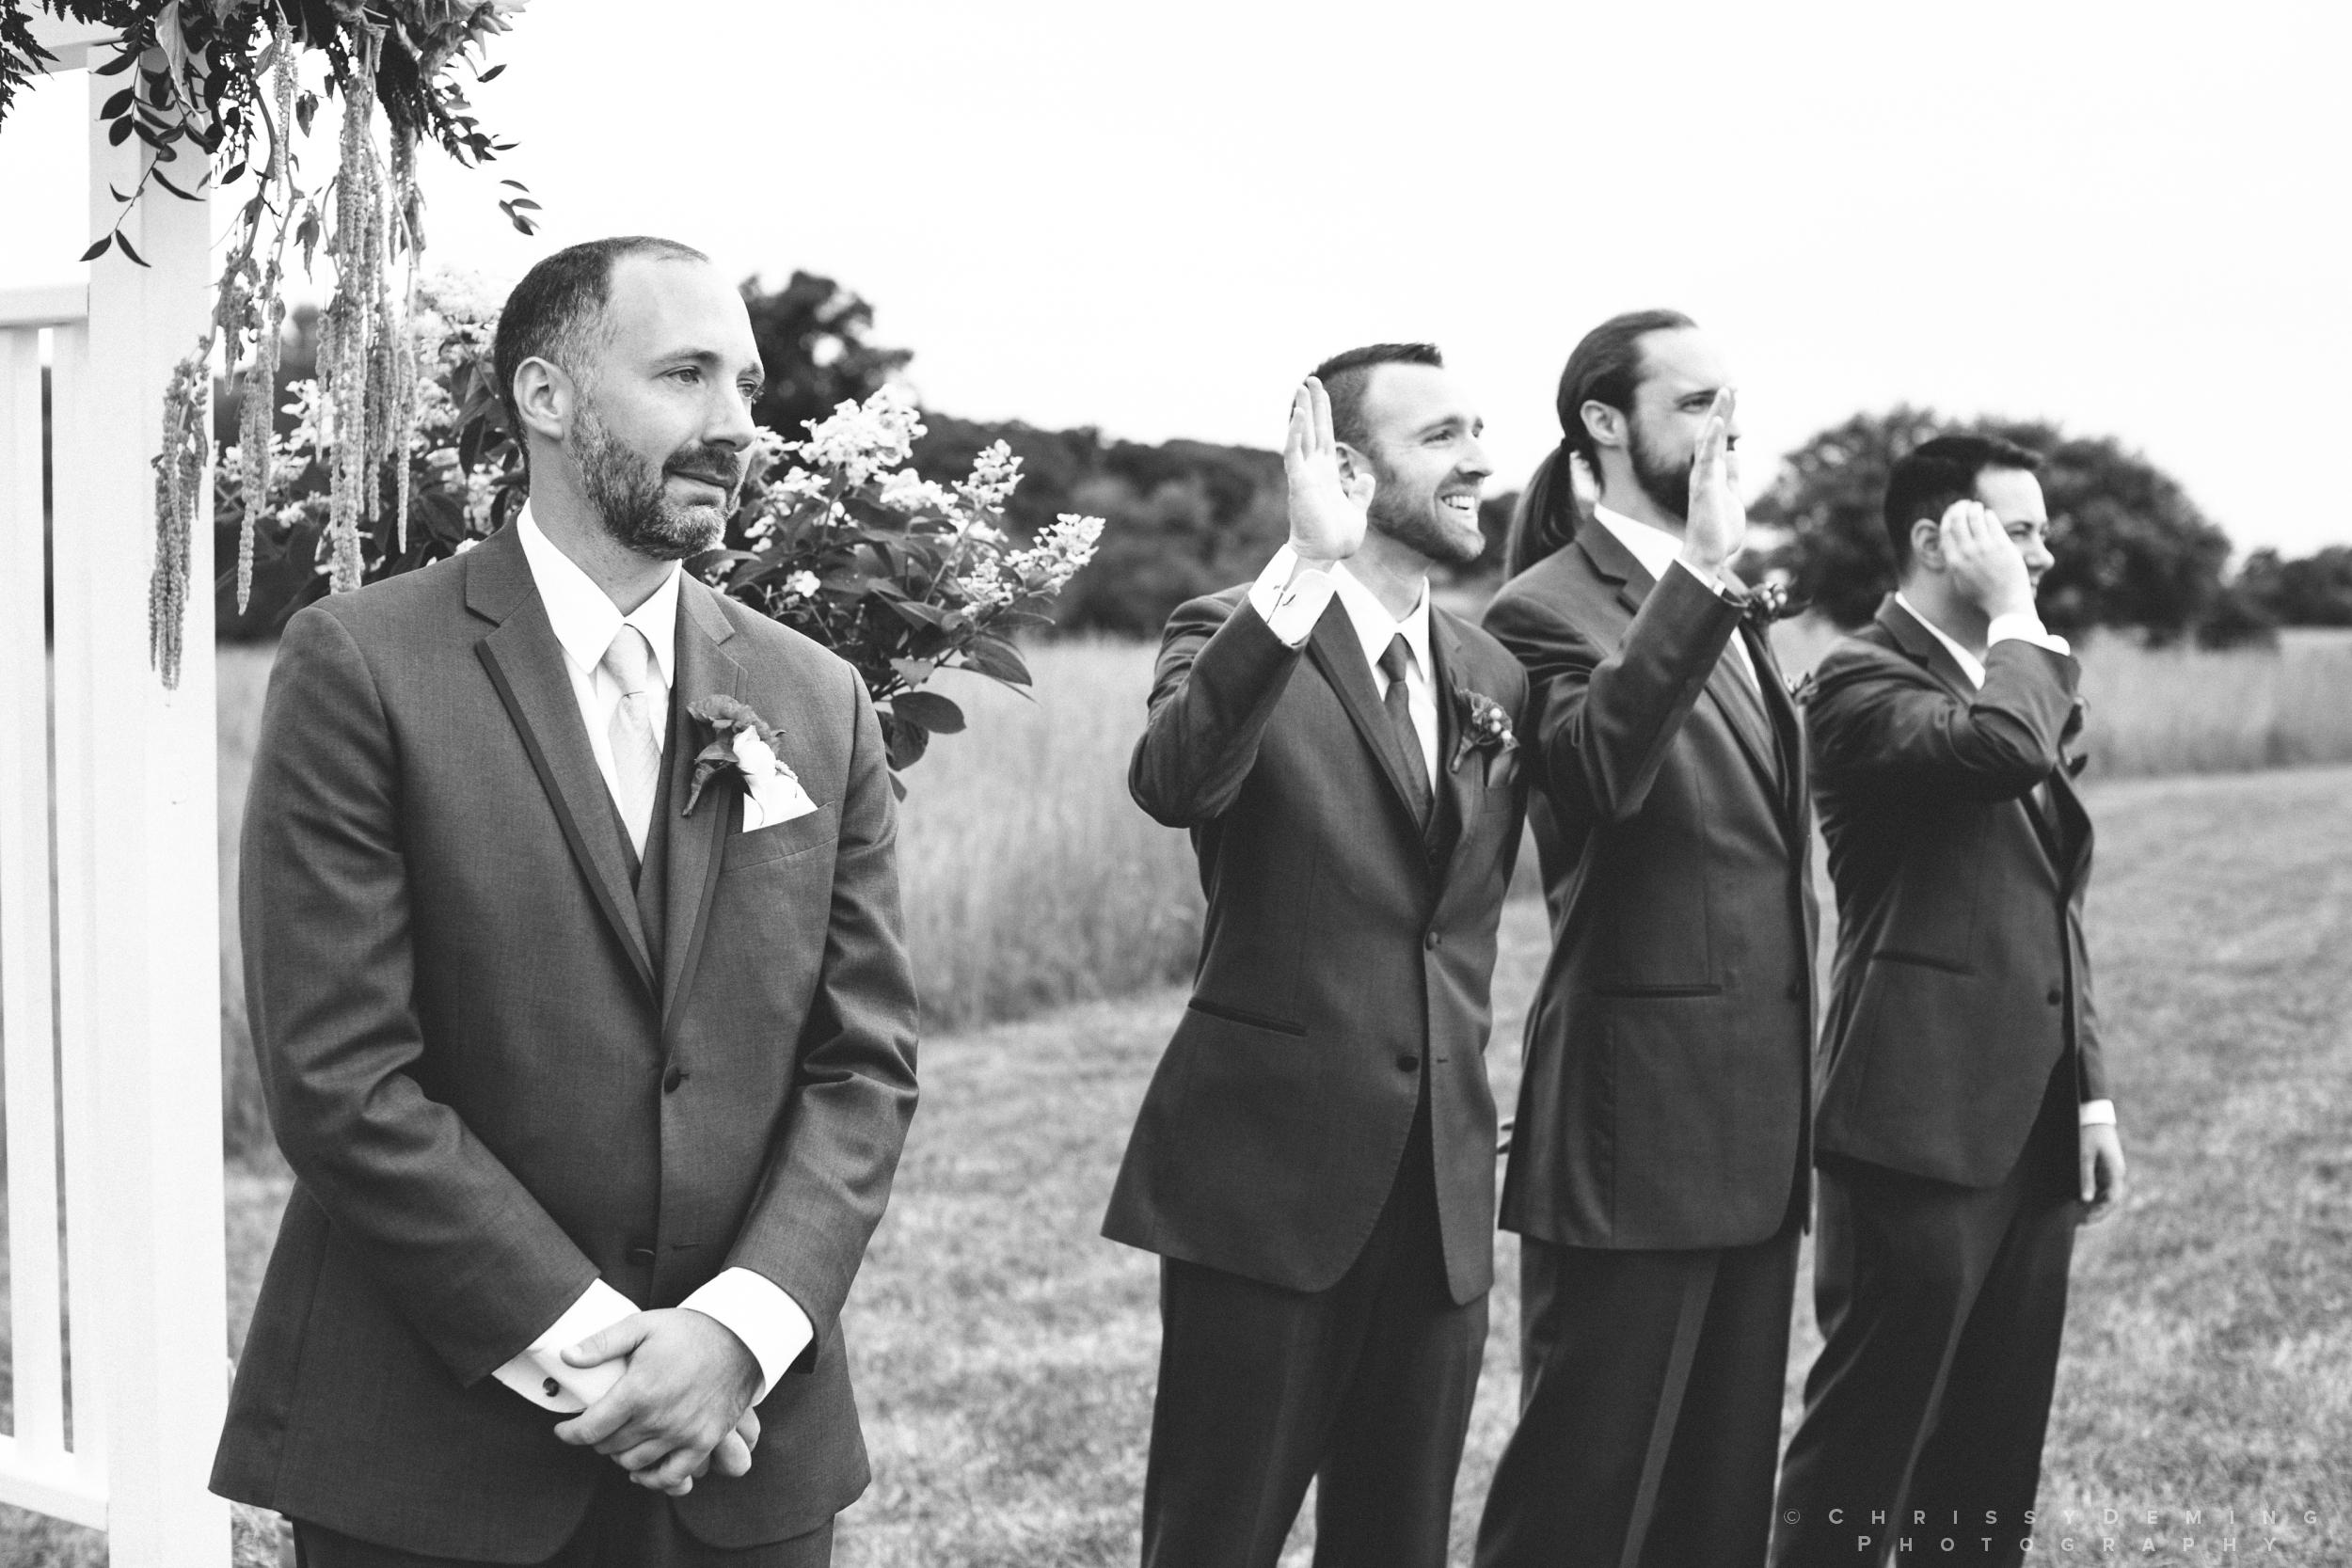 crete_IL_farm_wedding_photographer_0019.jpg